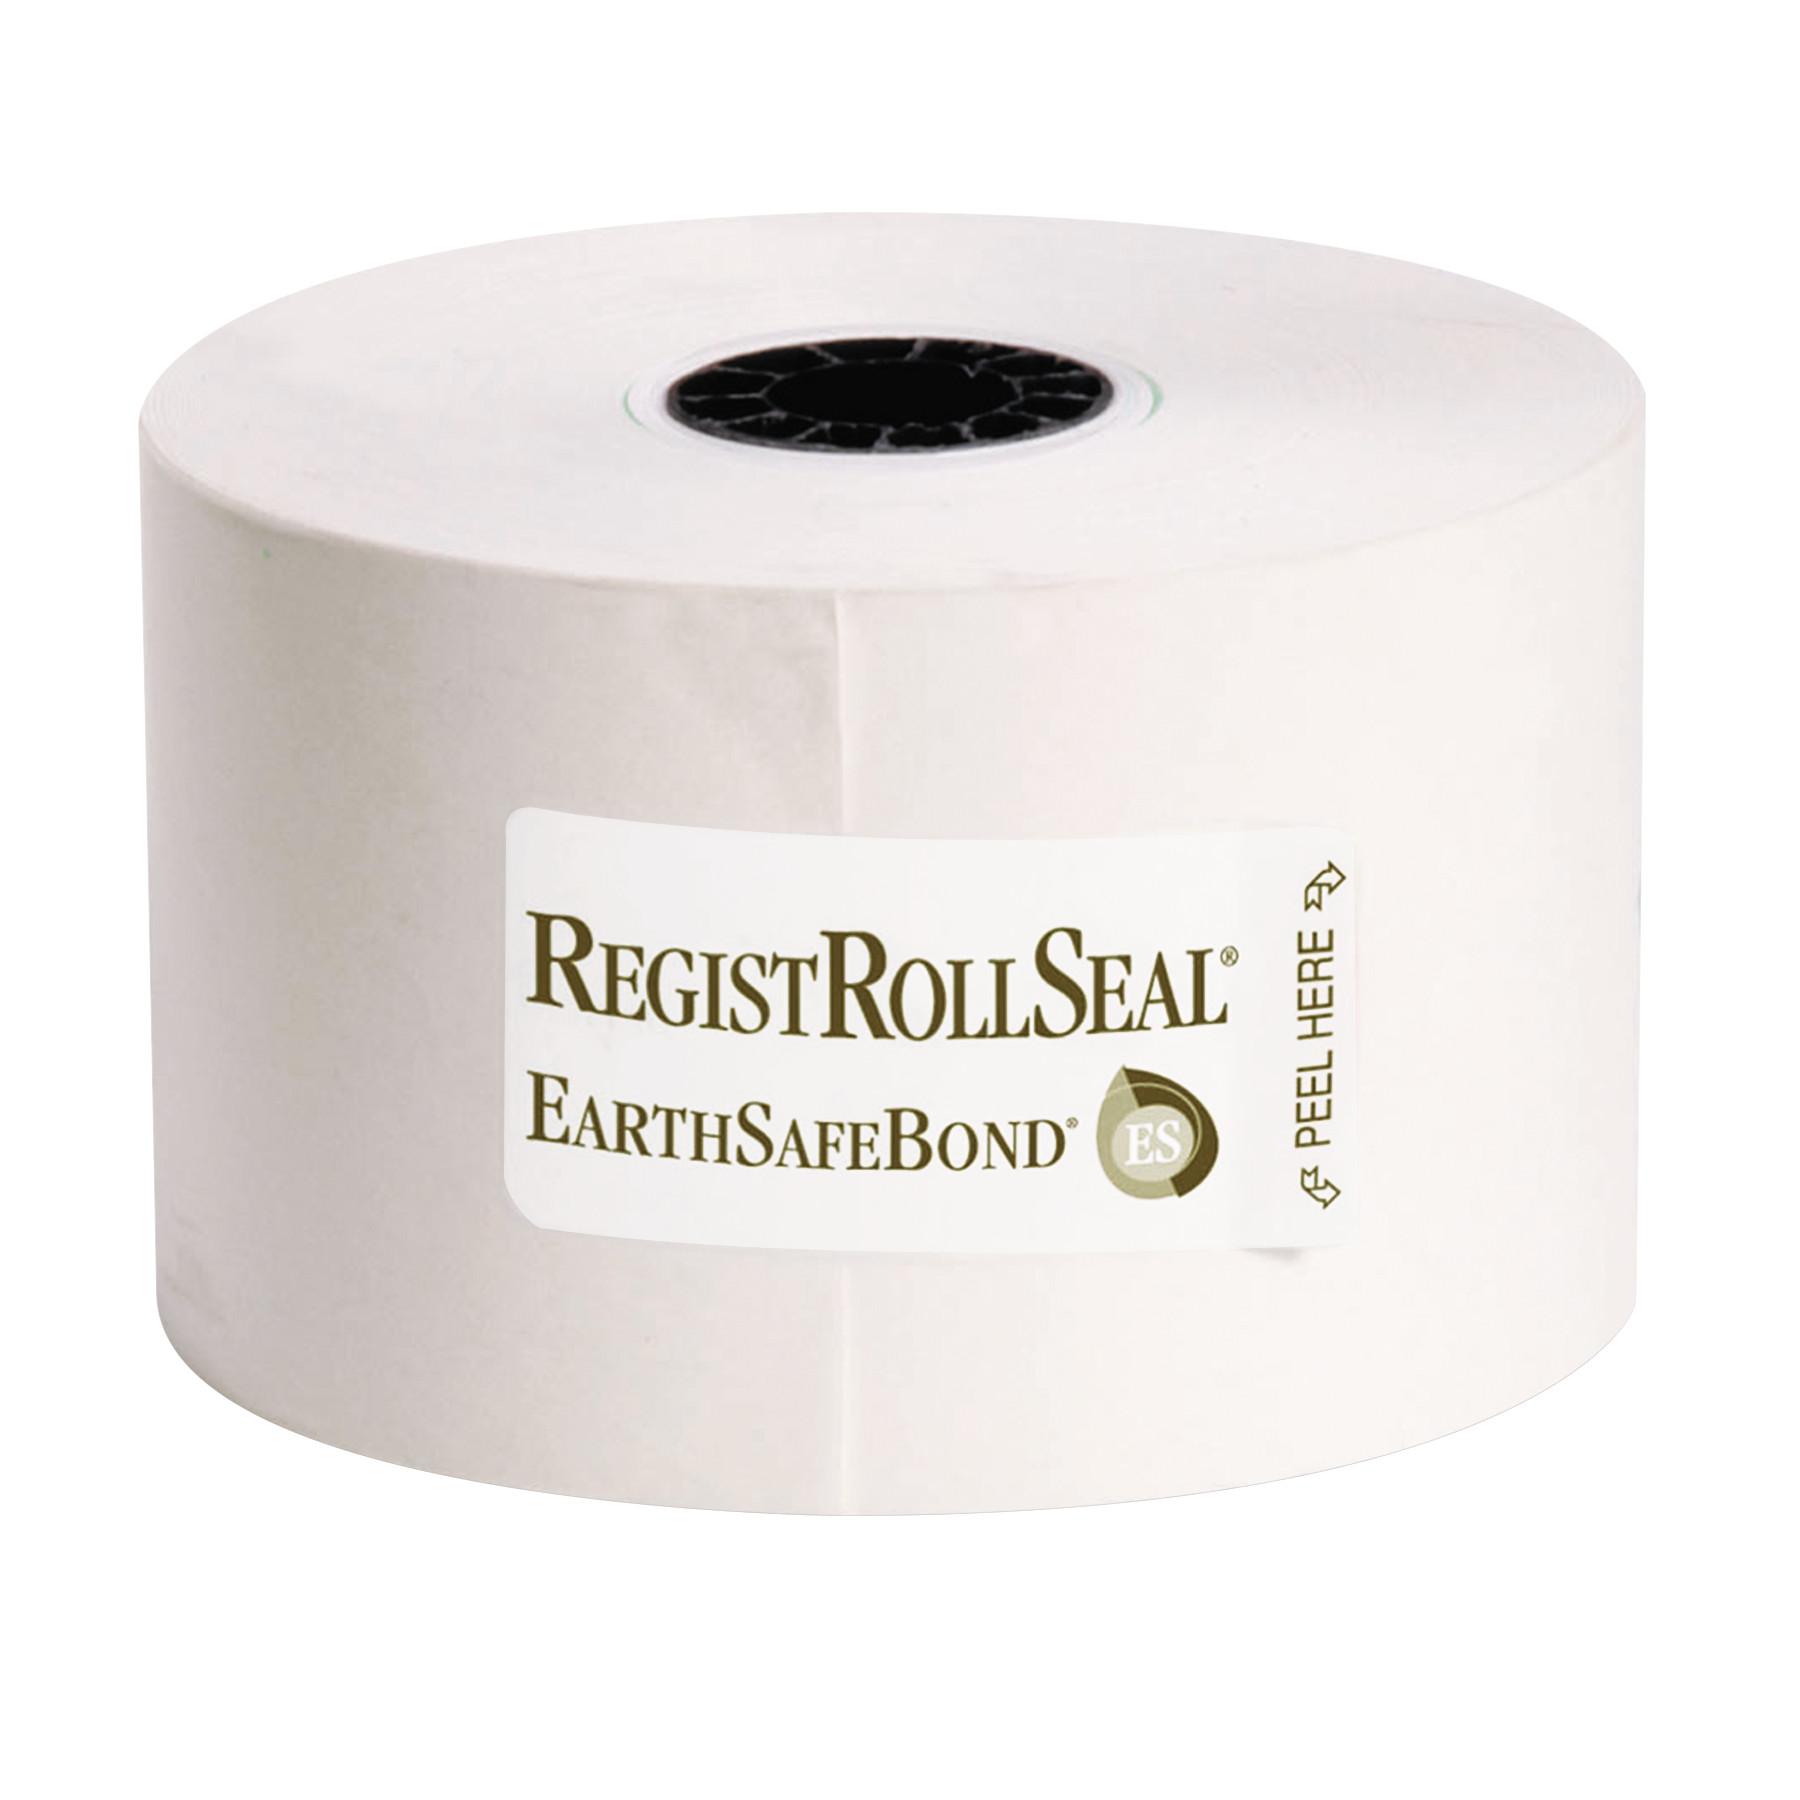 RegistRolls Point-of-Sale Rolls, 44mm x 165', White, 50/Carton